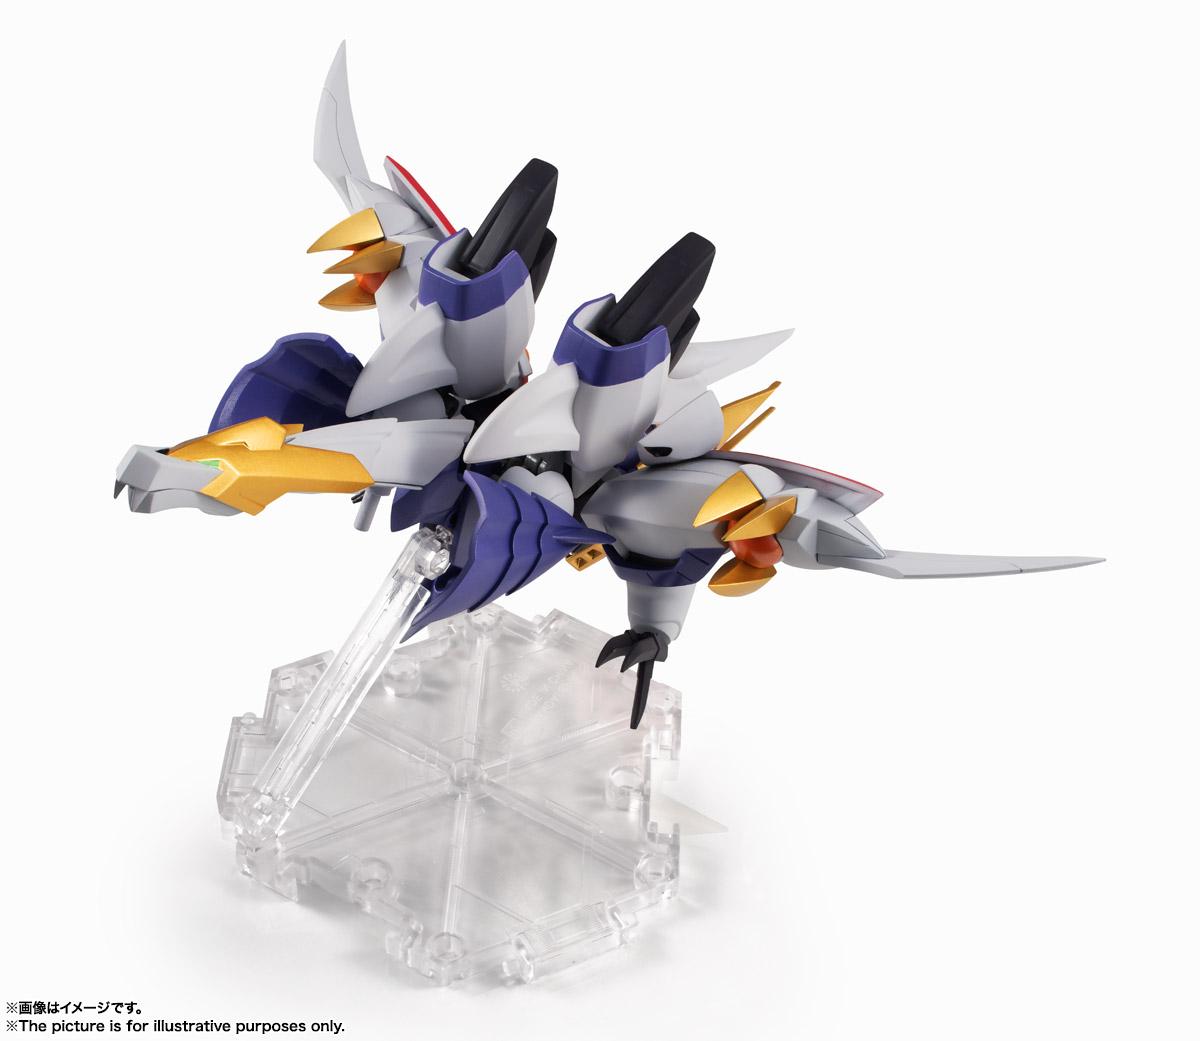 NXEDGE STYLE[MASHIN UNIT]『聖龍丸』魔神英雄伝ワタル 可動フィギュア-006